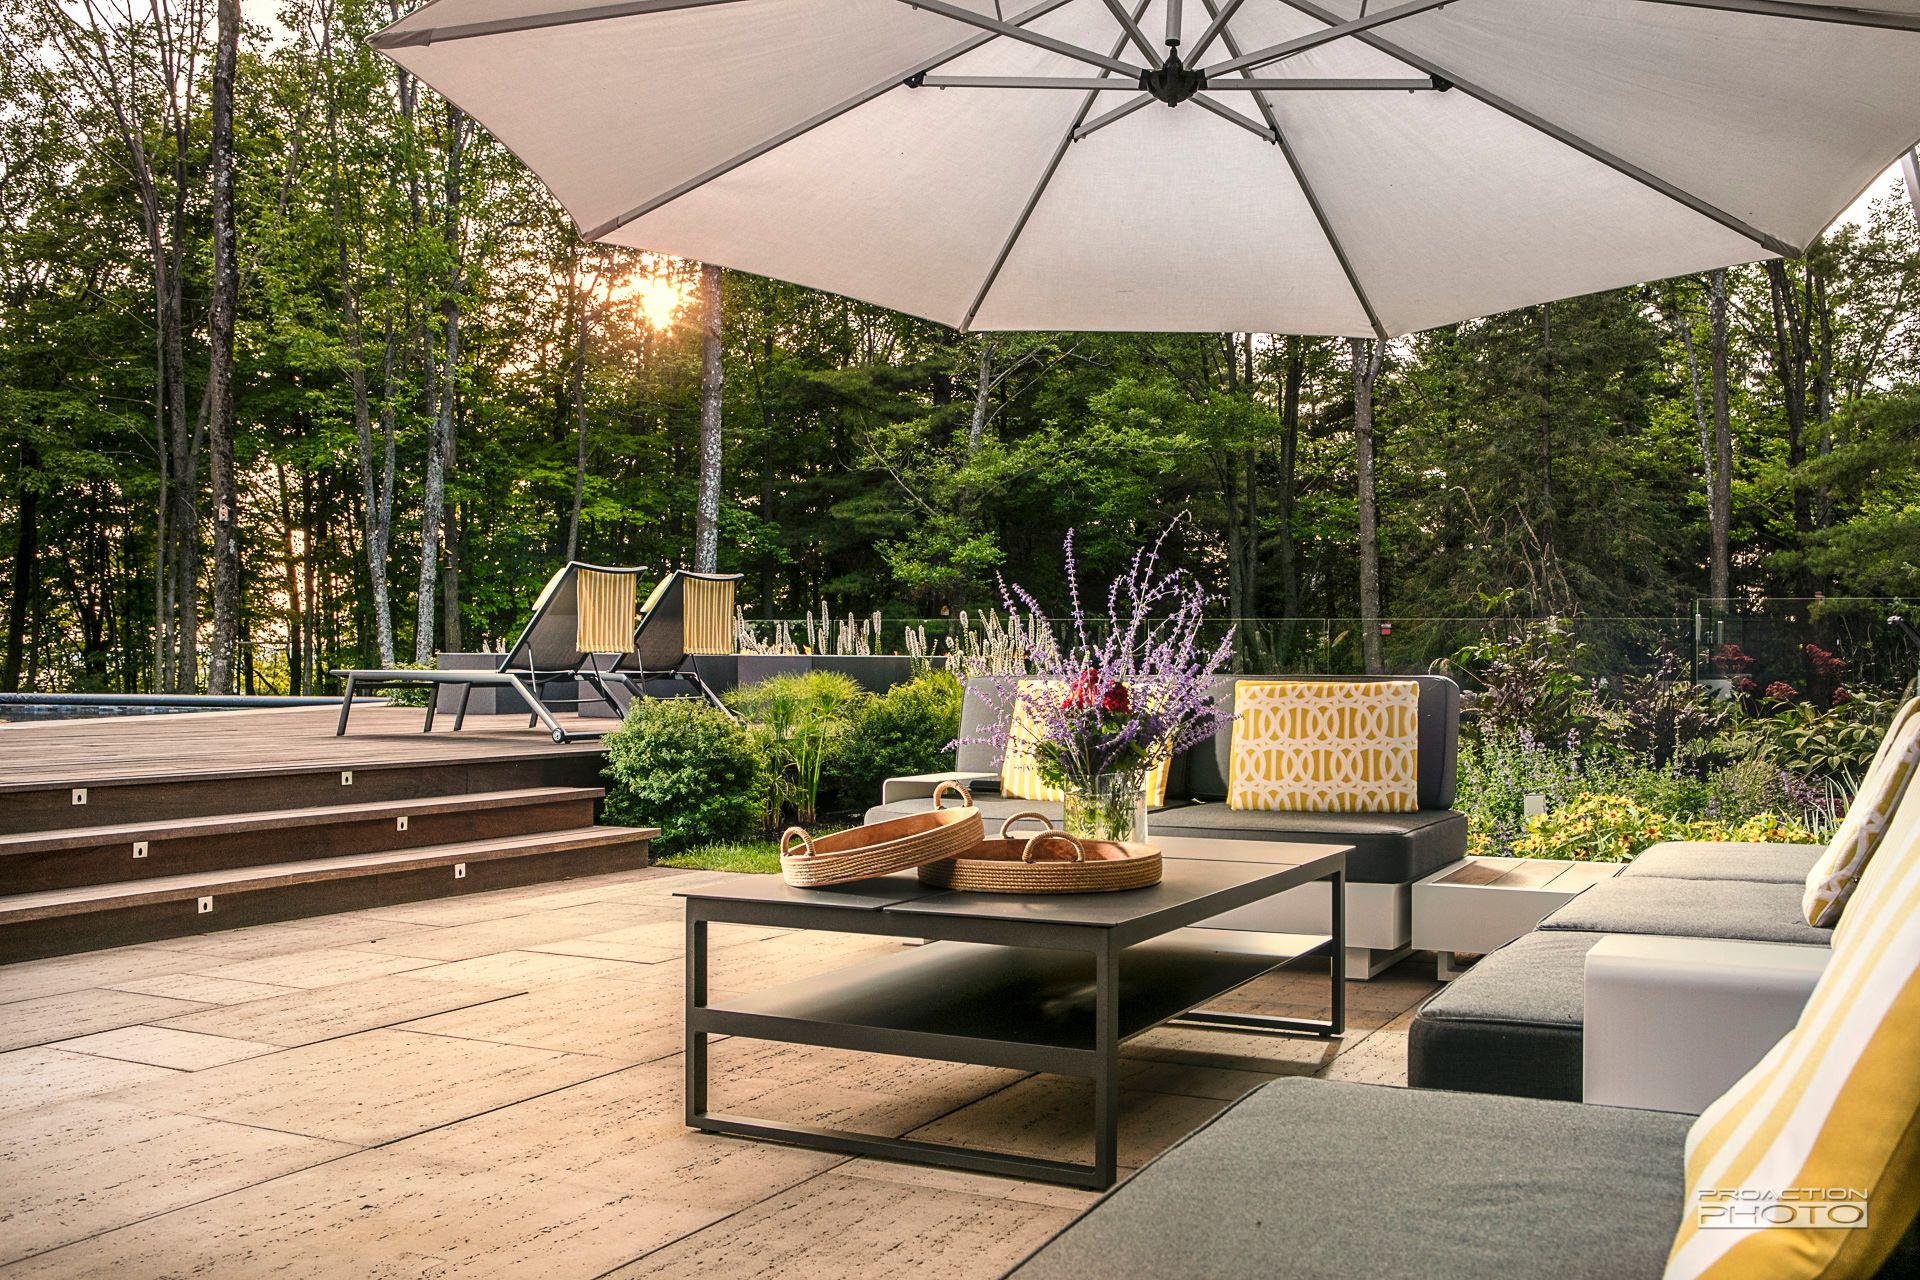 10 id es pour embellir votre terrasse cet t. Black Bedroom Furniture Sets. Home Design Ideas